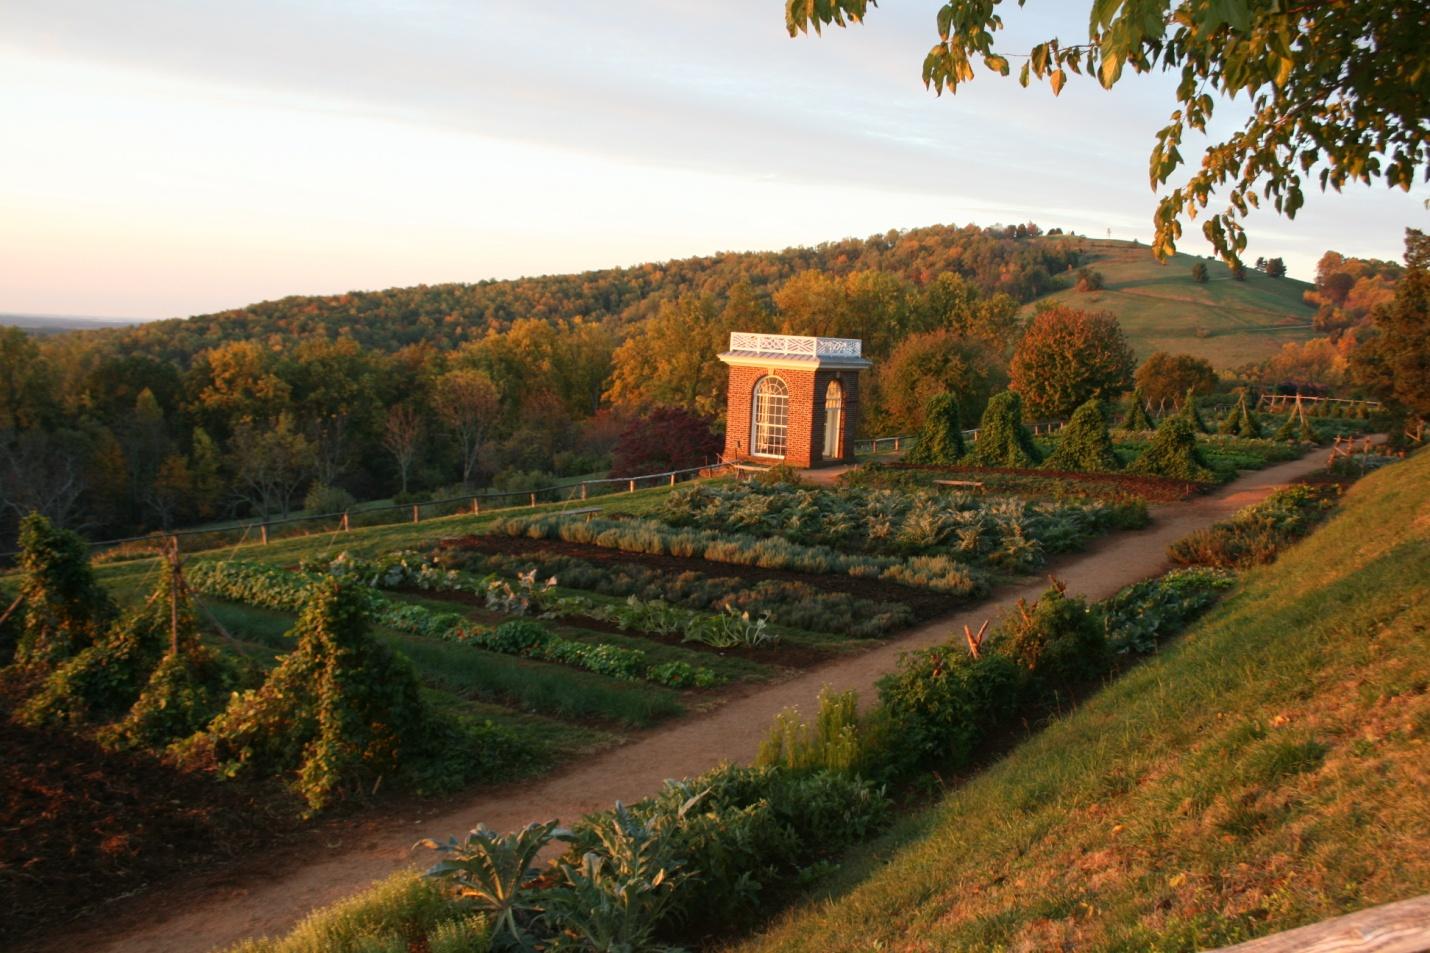 Monticello Vegetable Garden, November, 2011. Photo by Peter J. Hatch, courtesy of Thomas Jefferson Foundation